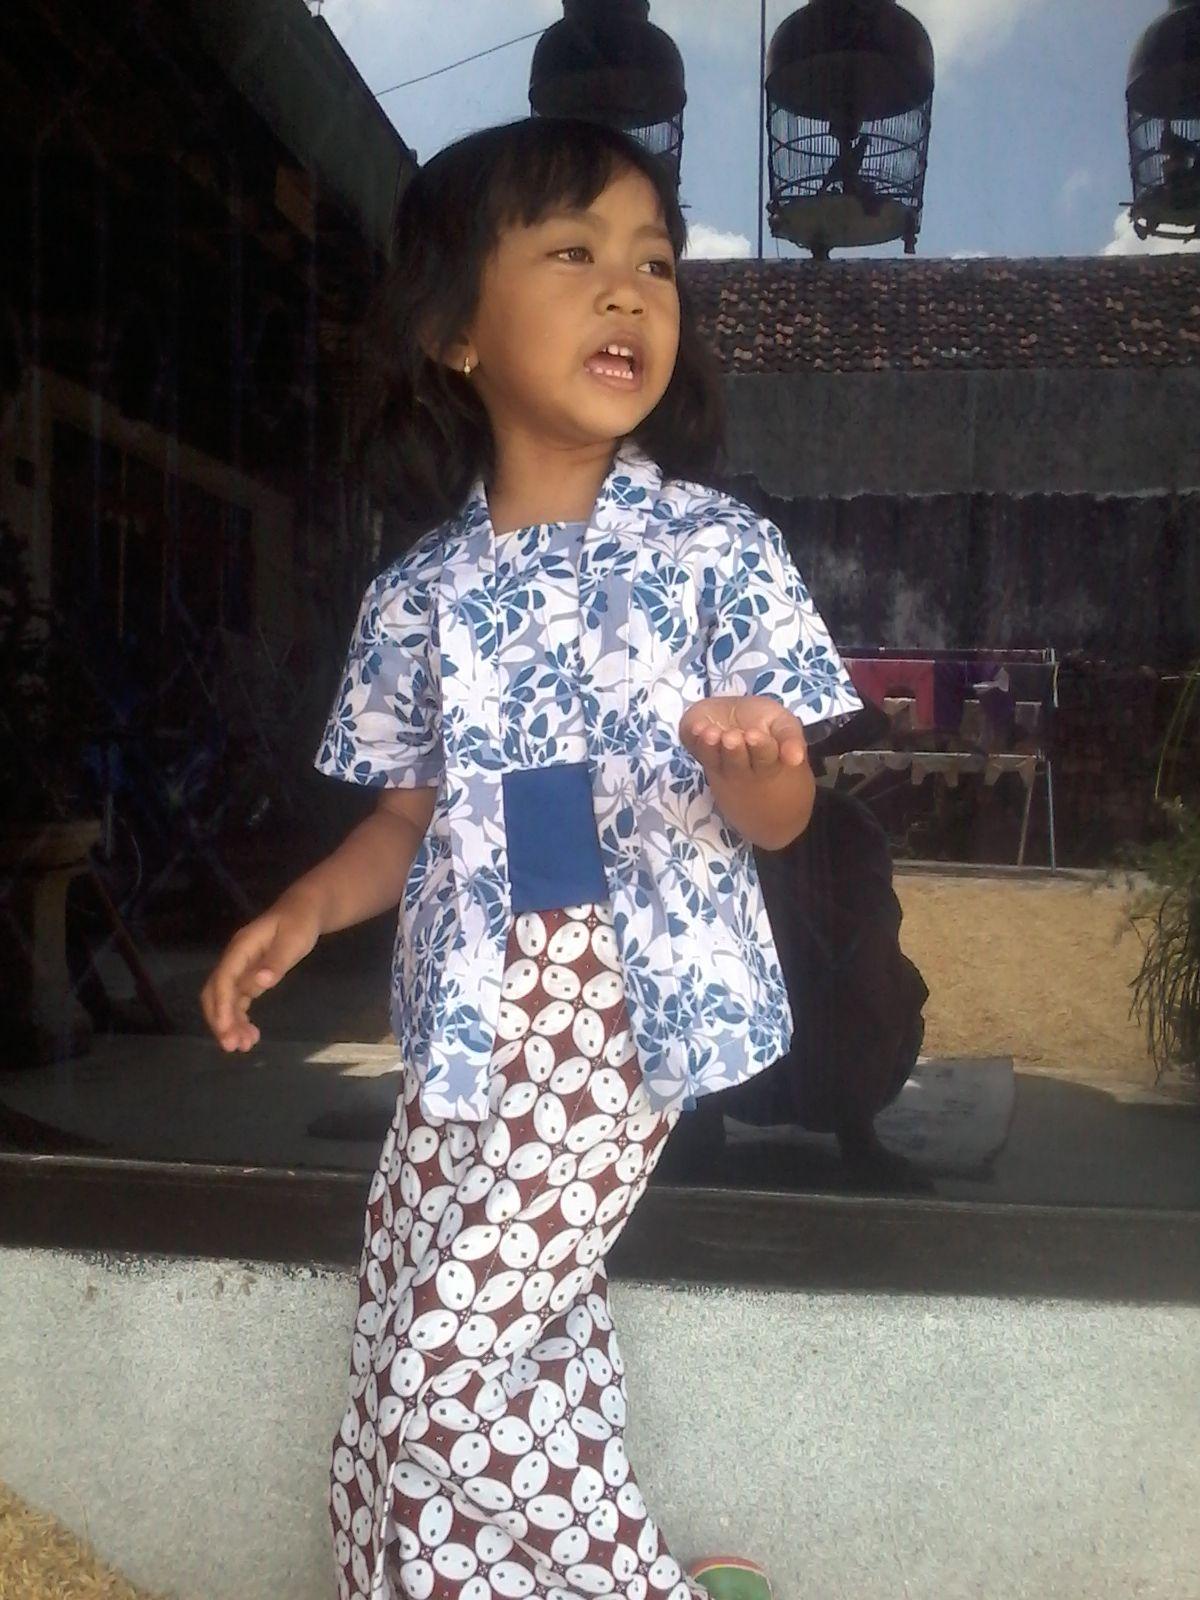 Kebaya Conjonctif Connective Kebaya Anak Boesoem Kutubaru